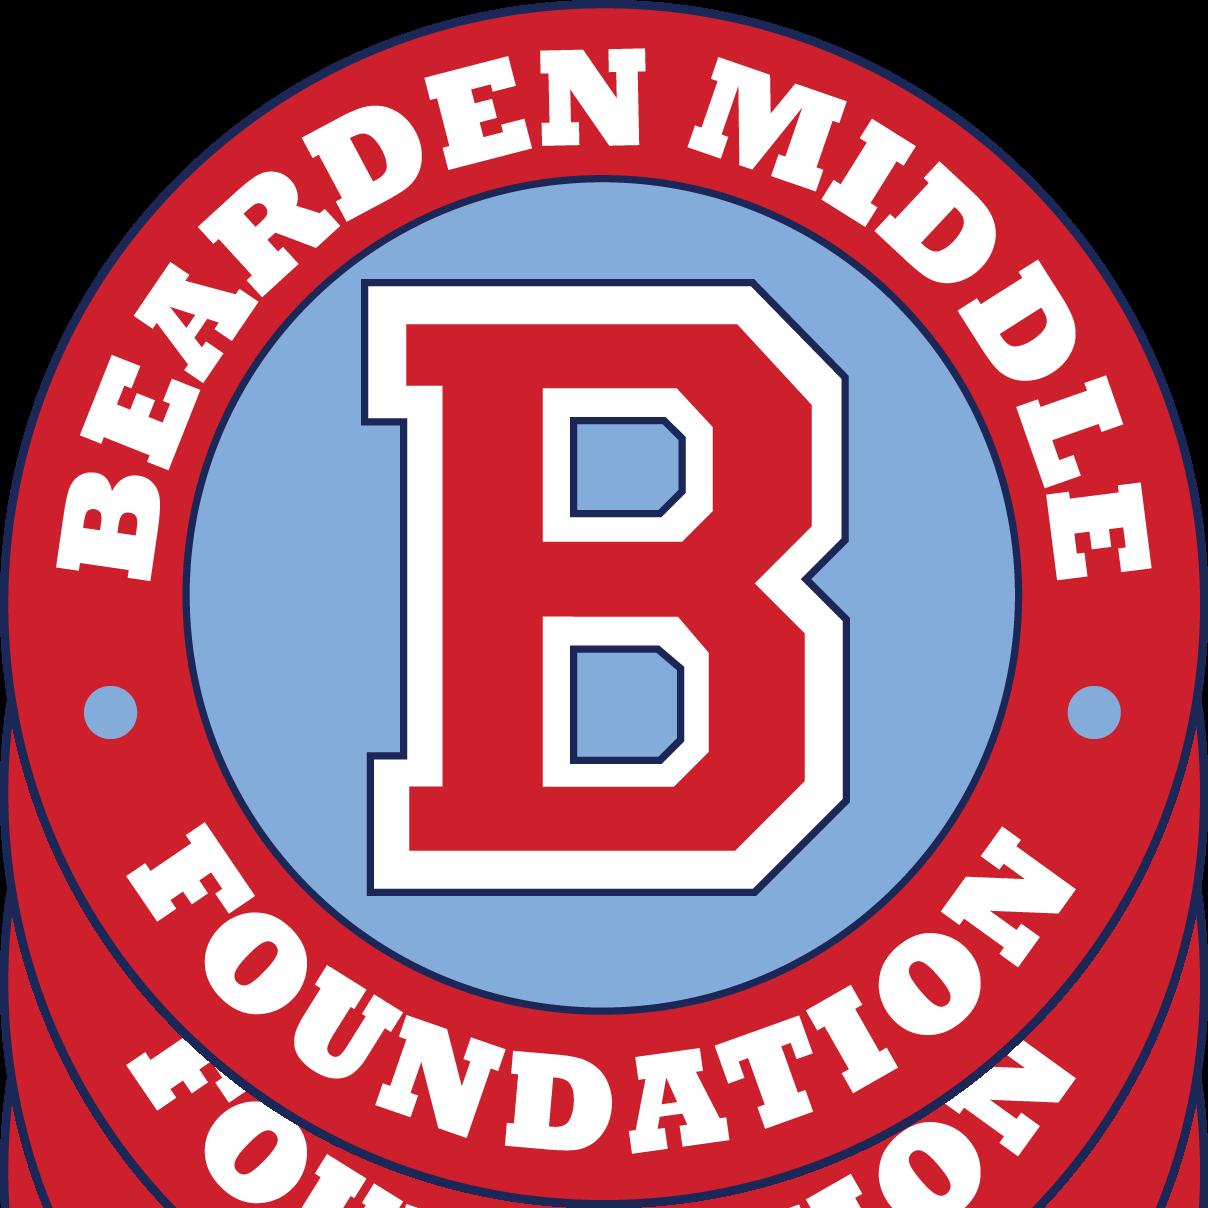 Bearden Middle School Foundation